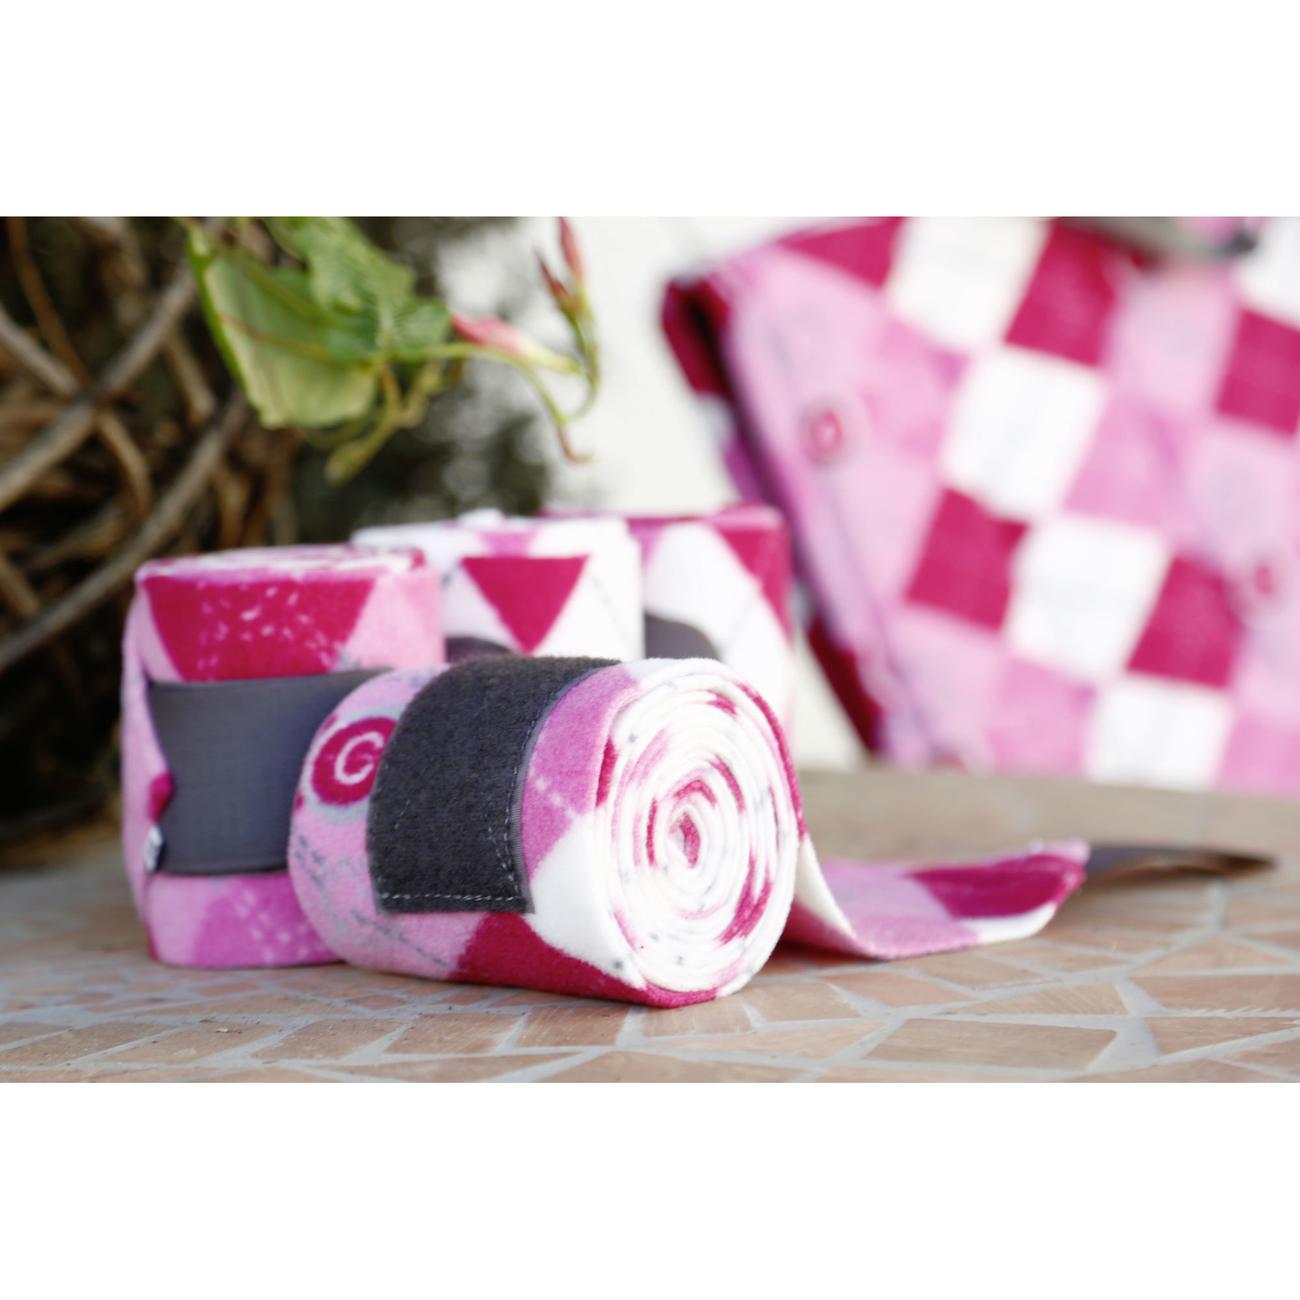 Covalliero Pferde Fleece-Bandage Lilli für Pony, Bild 3